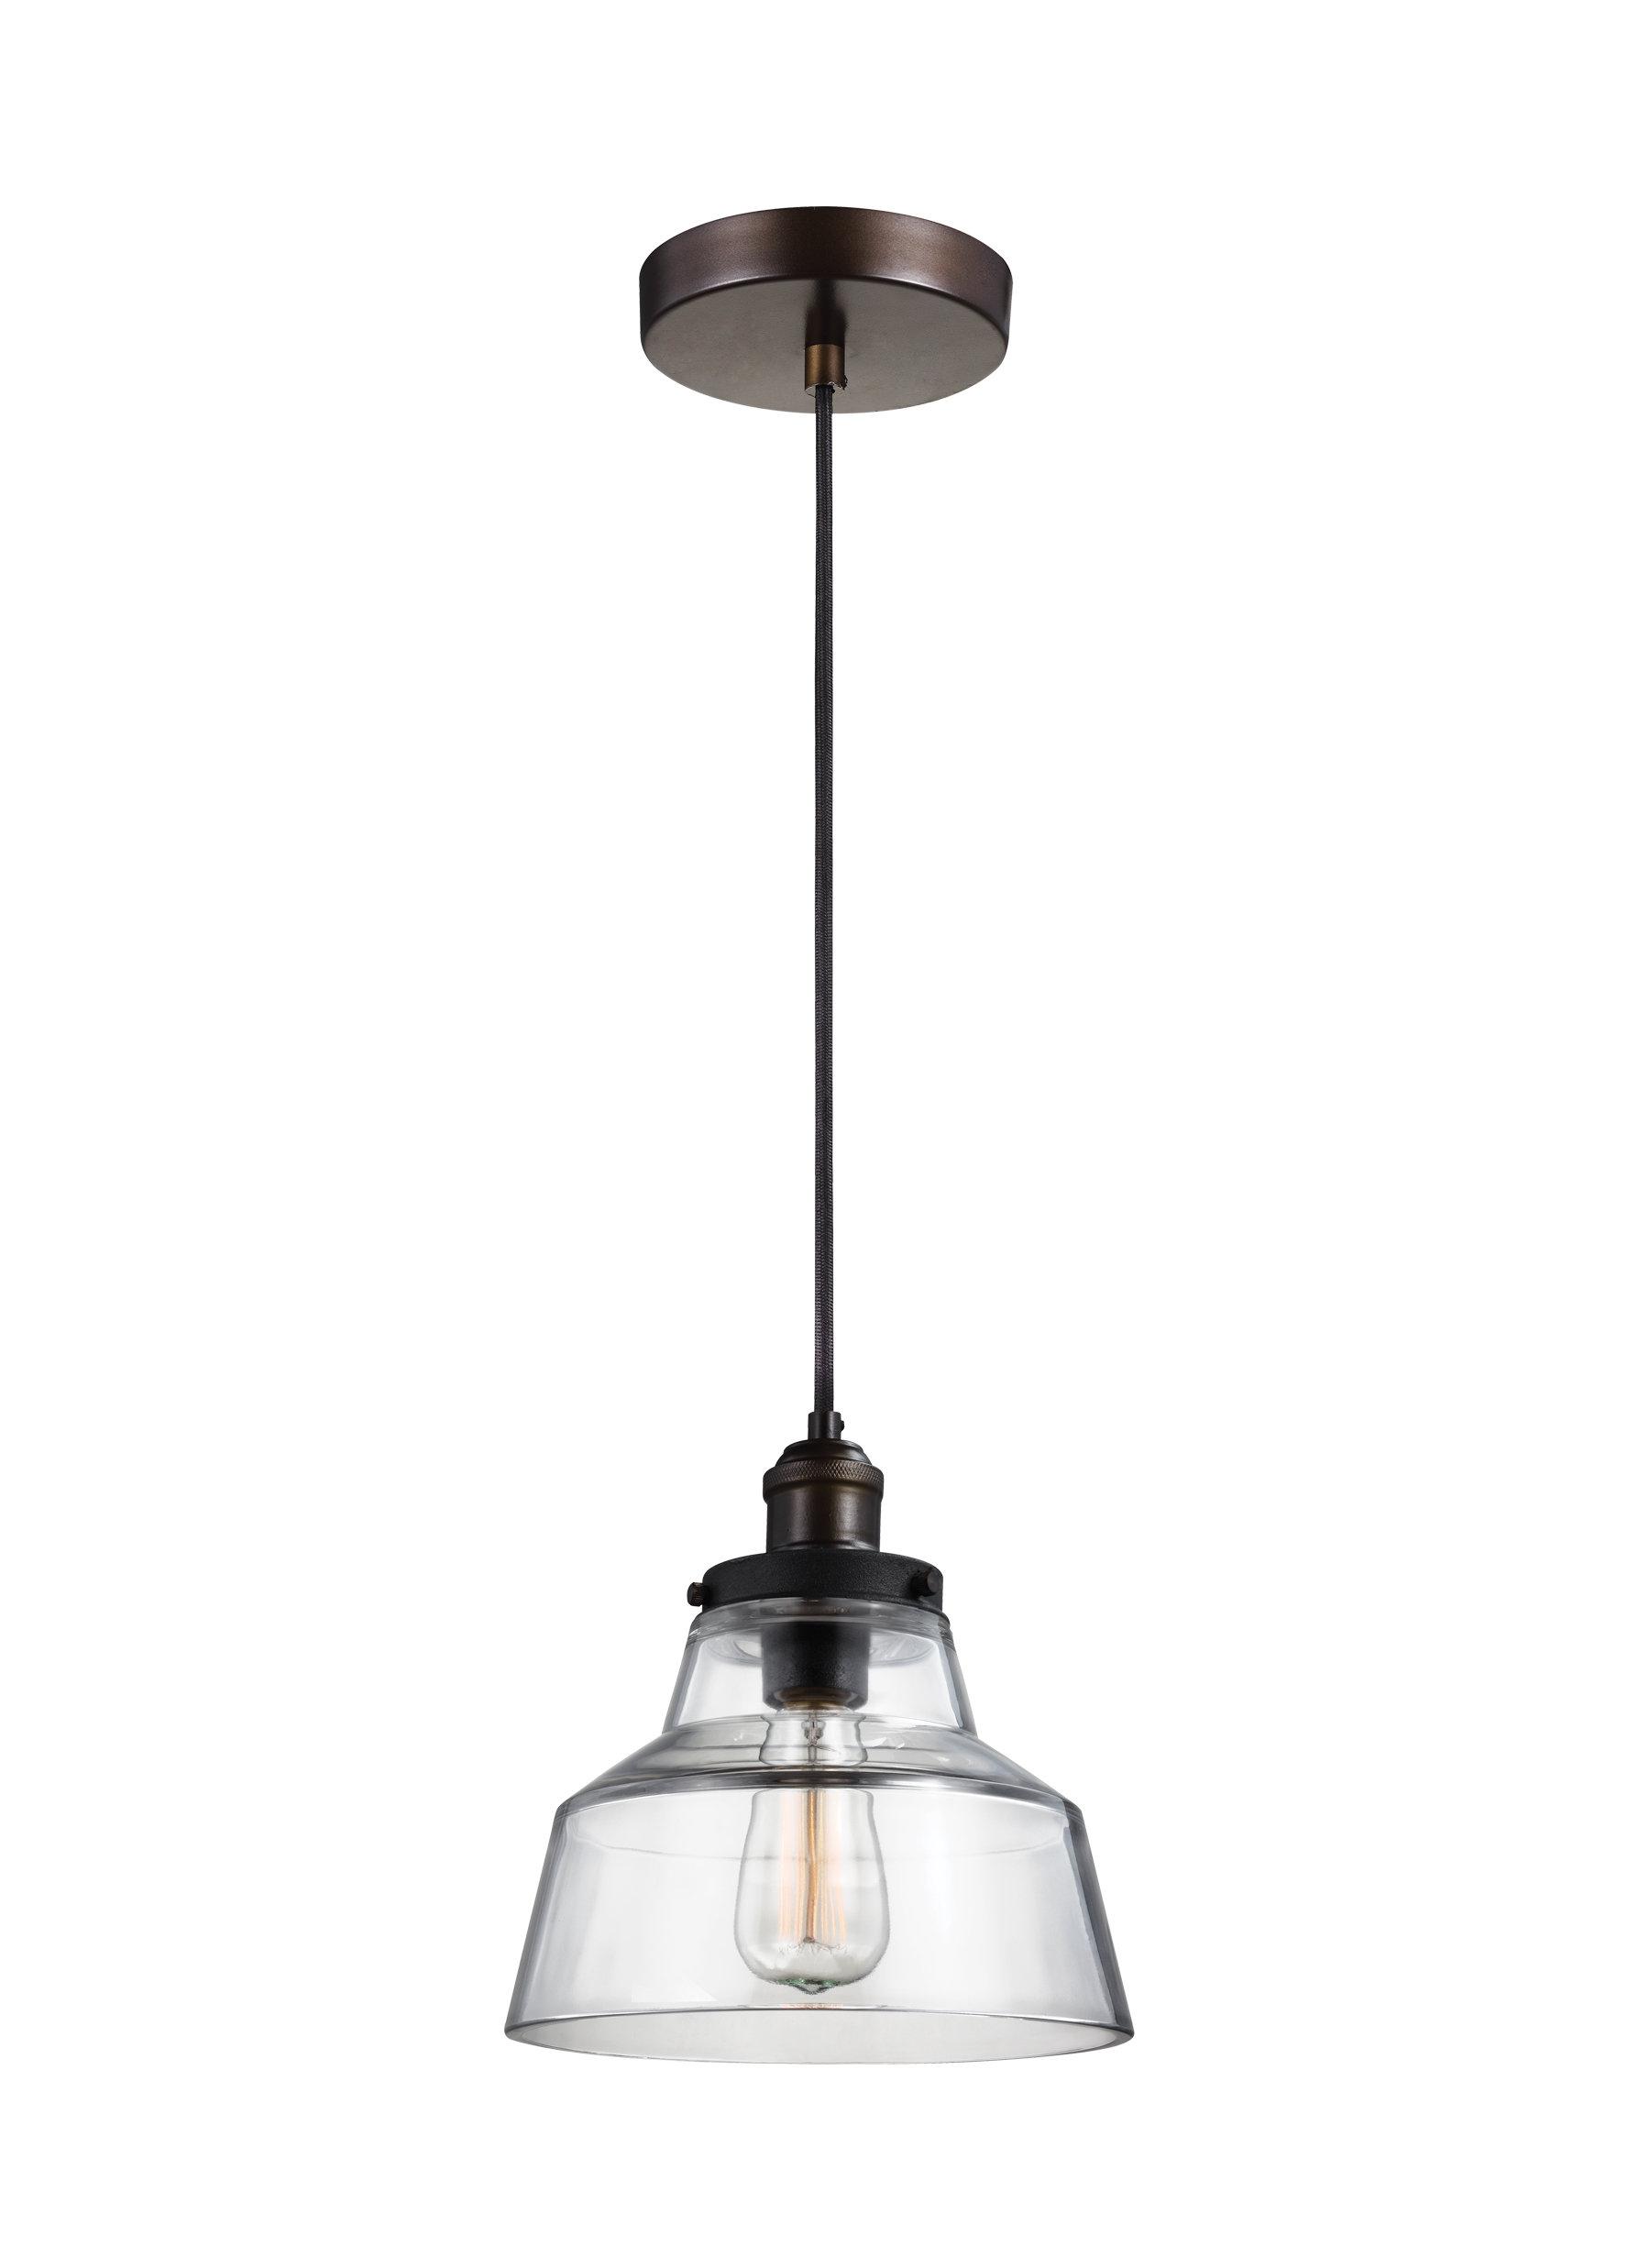 Popular Roslindale 1 Light Single Bell Pendants Within Sherman 1 Light Single Geometric Pendant (View 14 of 25)